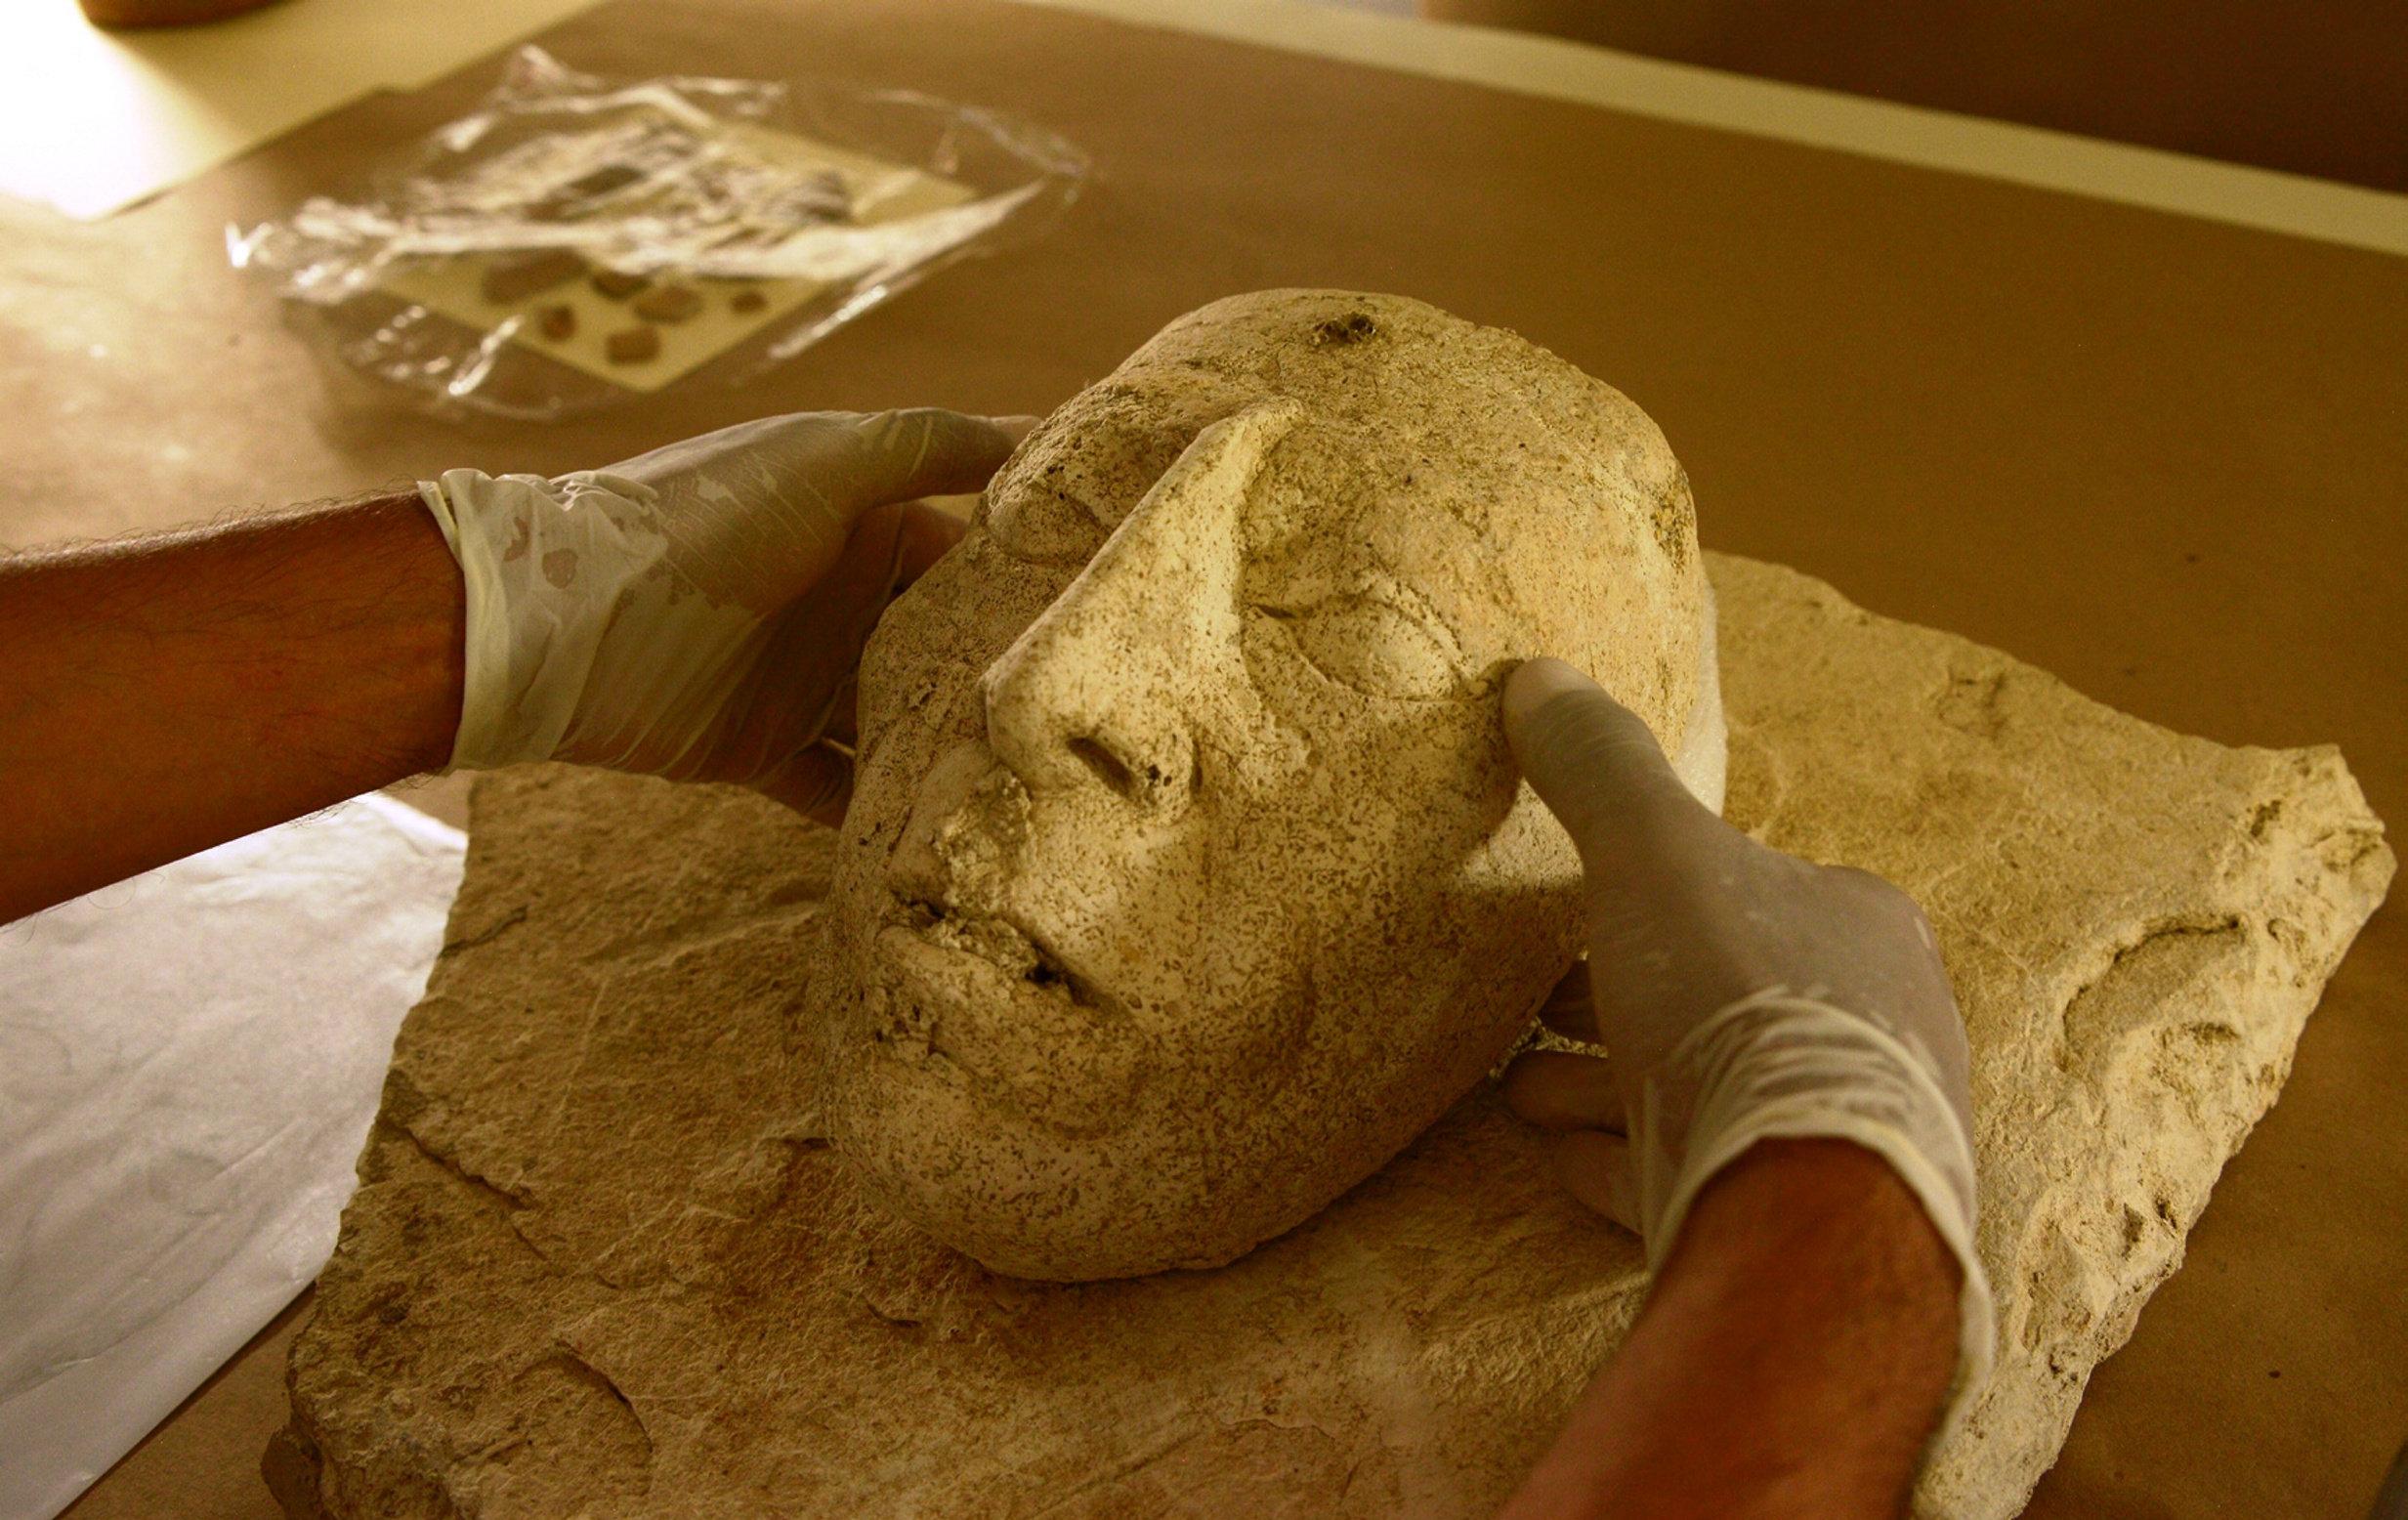 Máscara de estuco de Pakal, encontrada en Palenque, México